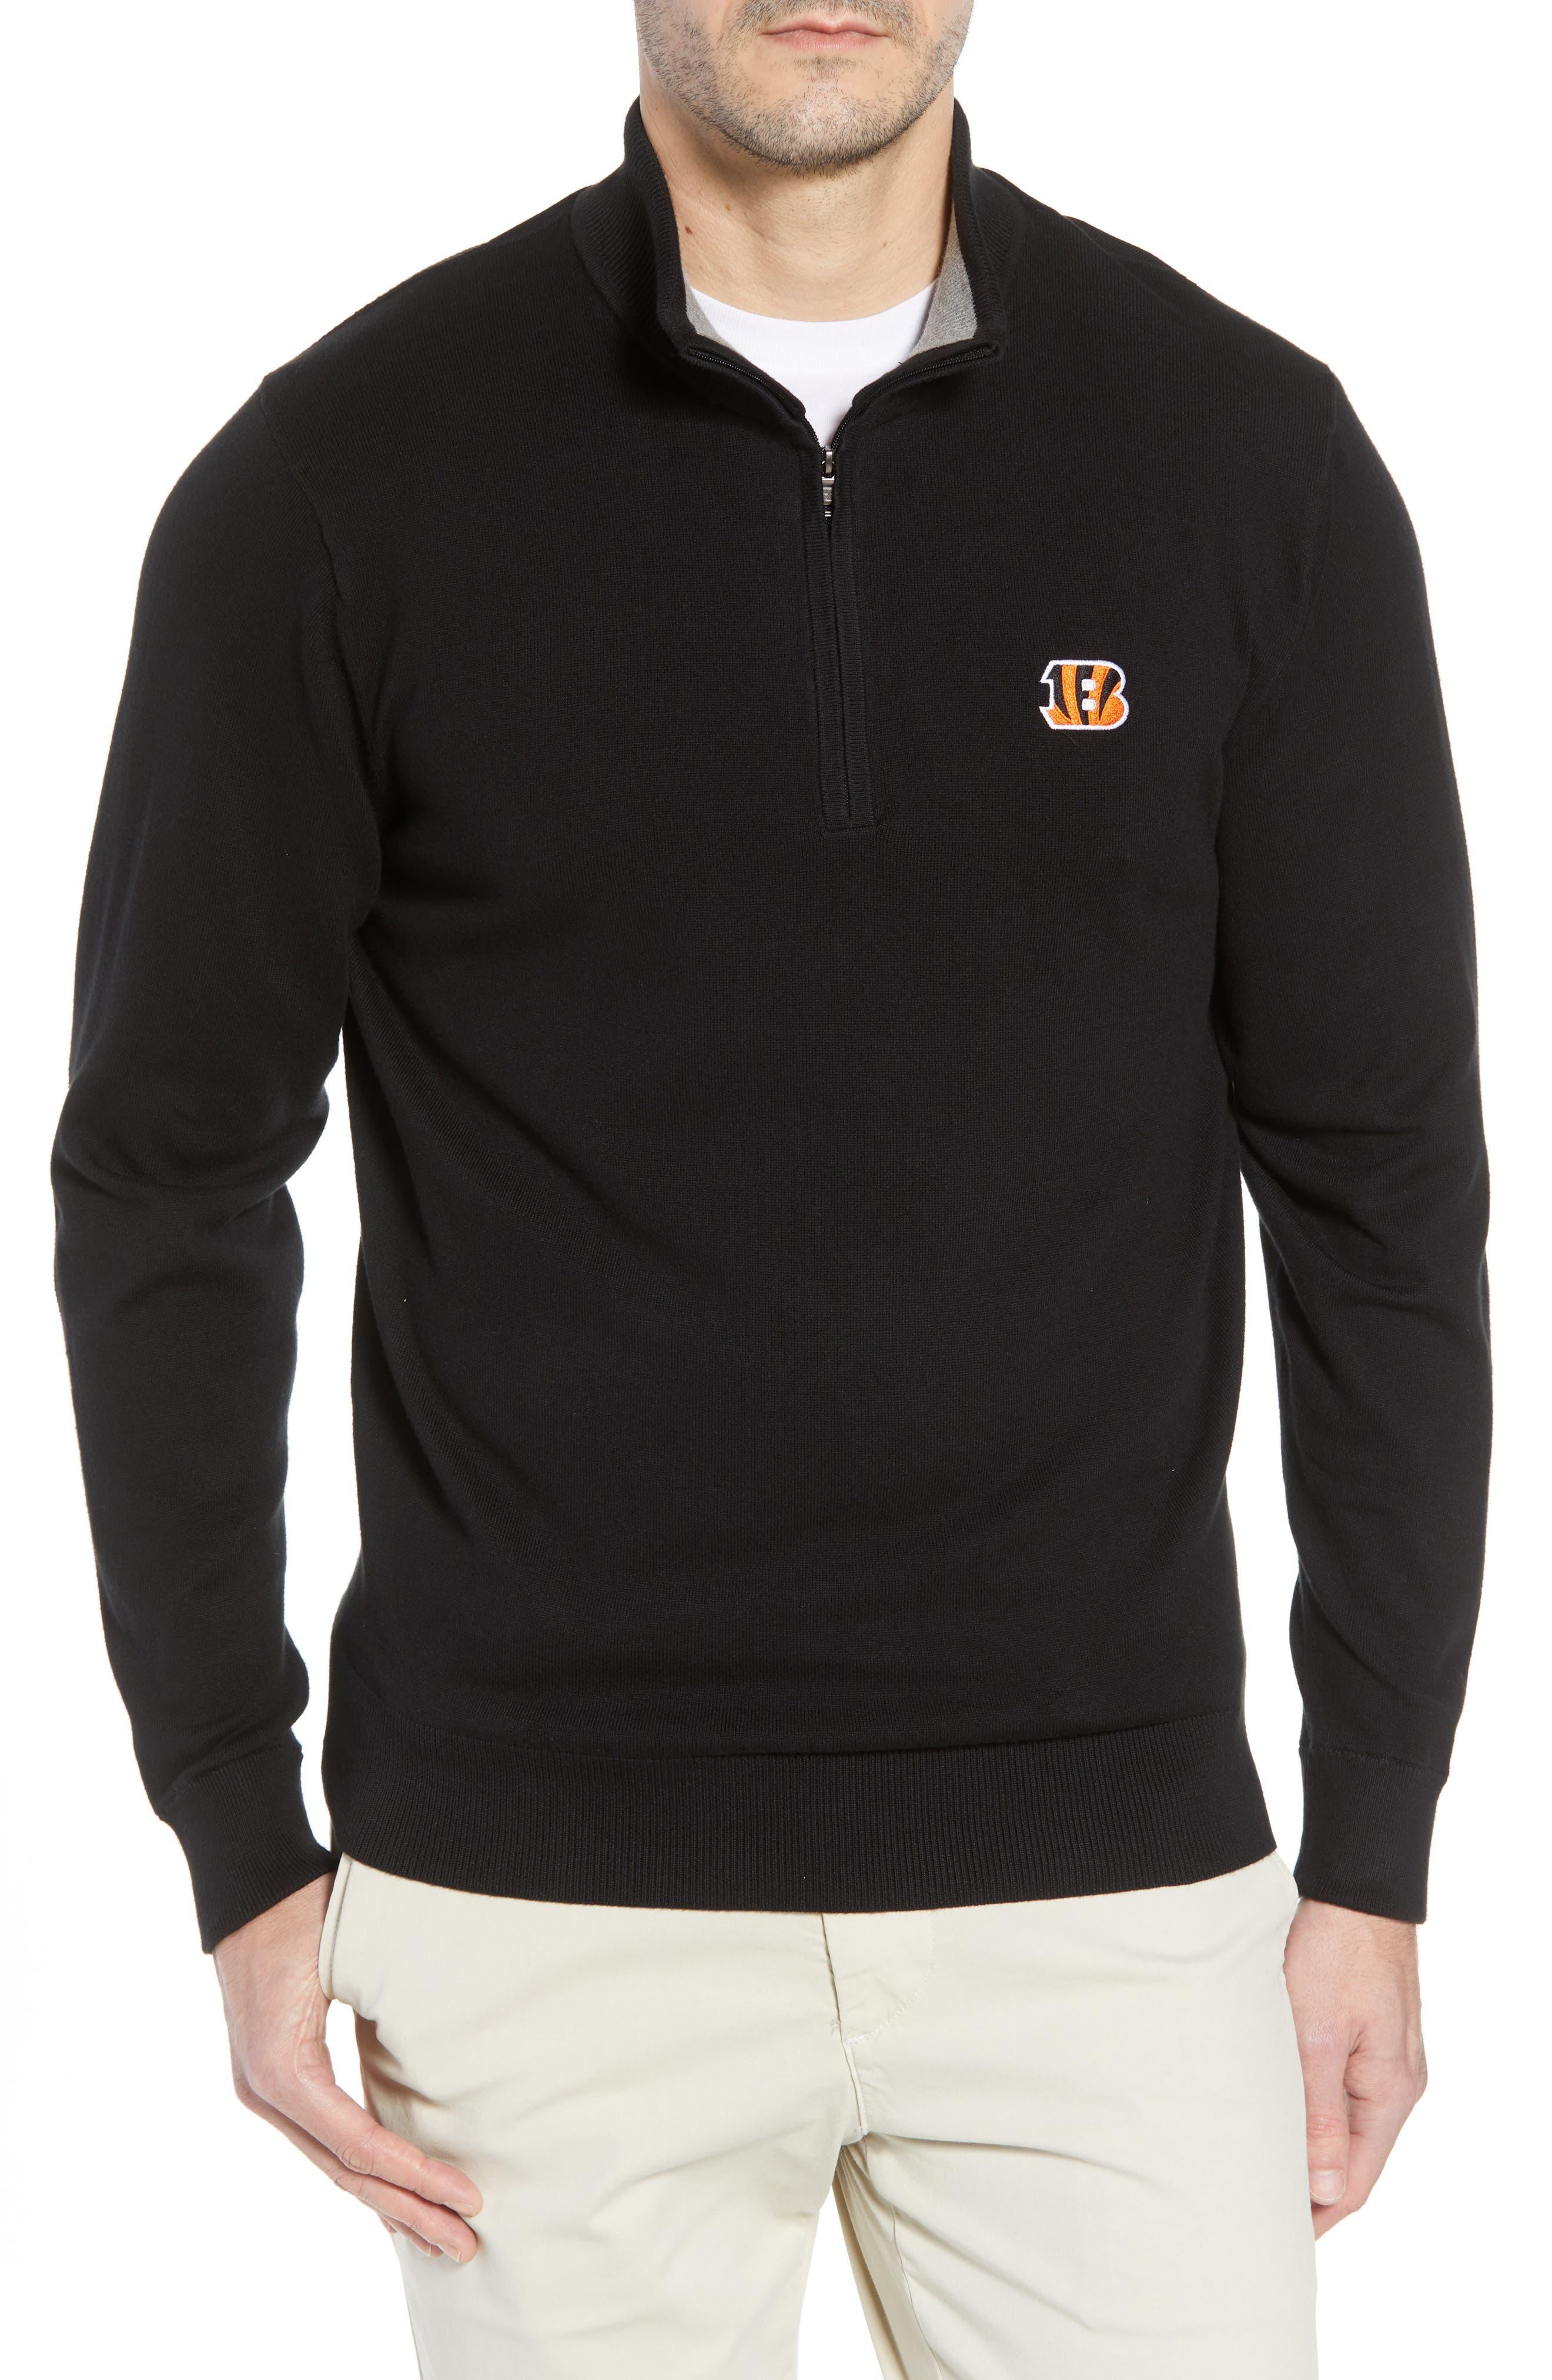 Cincinnati Bengals - Lakemont Regular Fit Quarter Zip Sweater,                         Main,                         color, 001